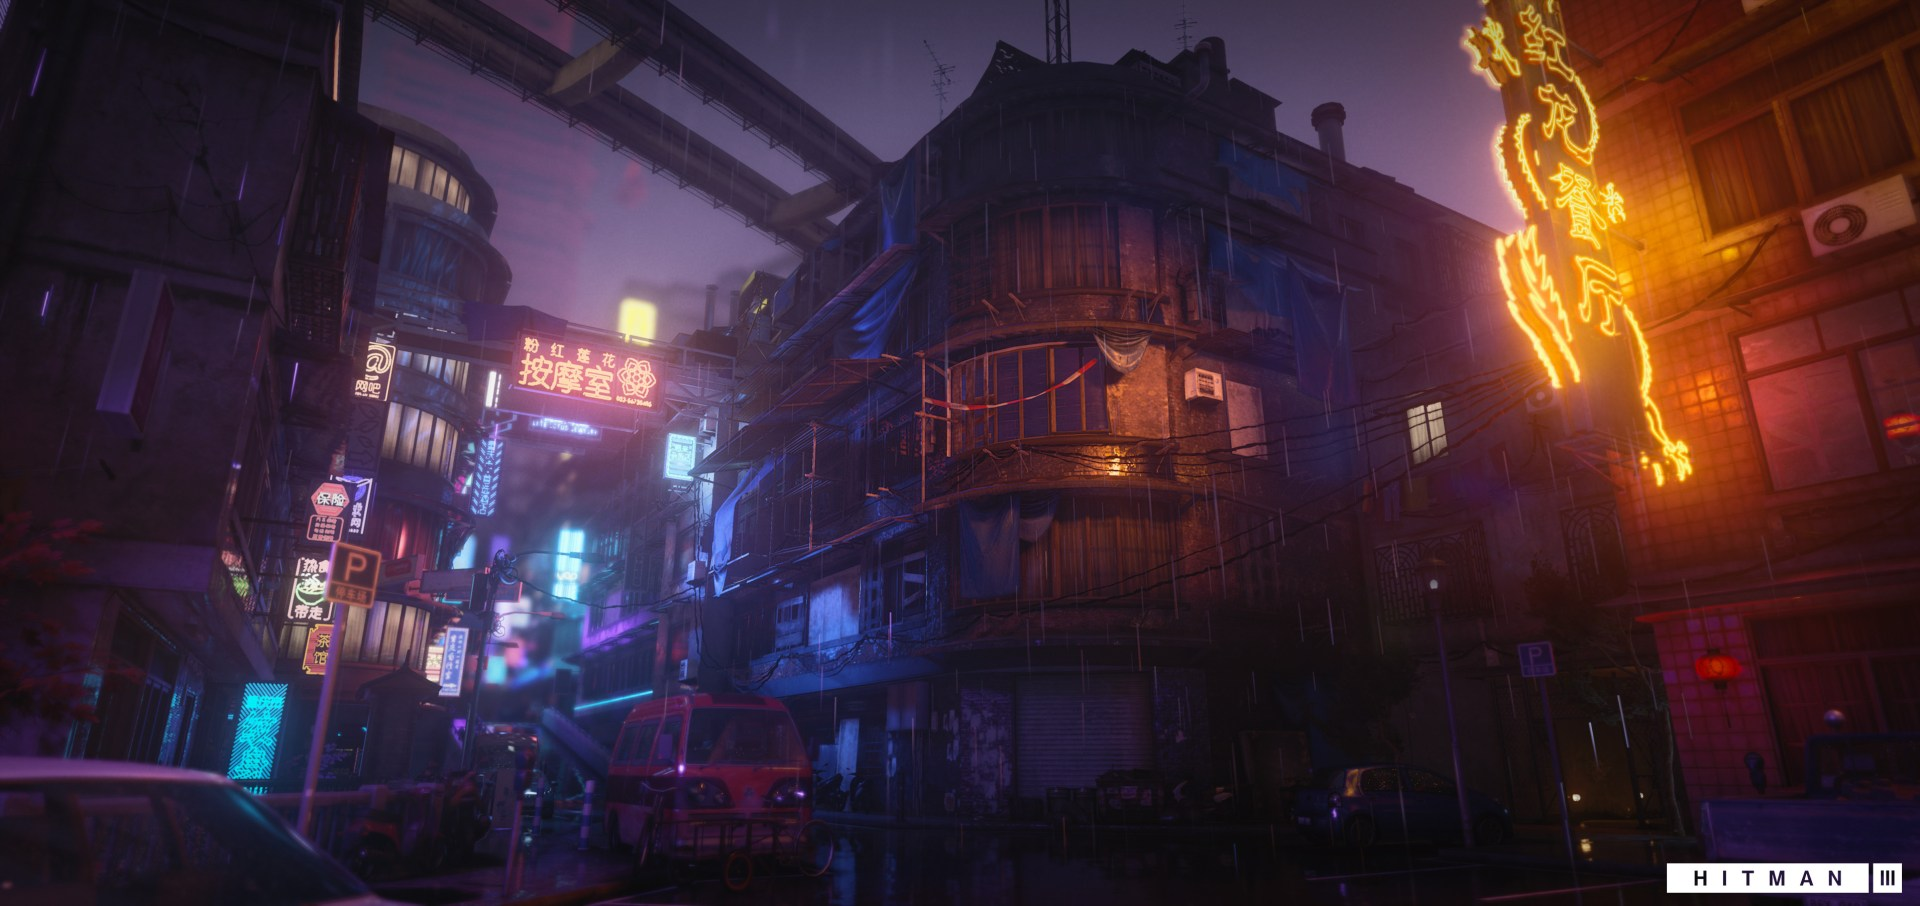 Quelle: ArtStation - Manne Westermark - Hitman 3: Chongqing Leuchtreklame